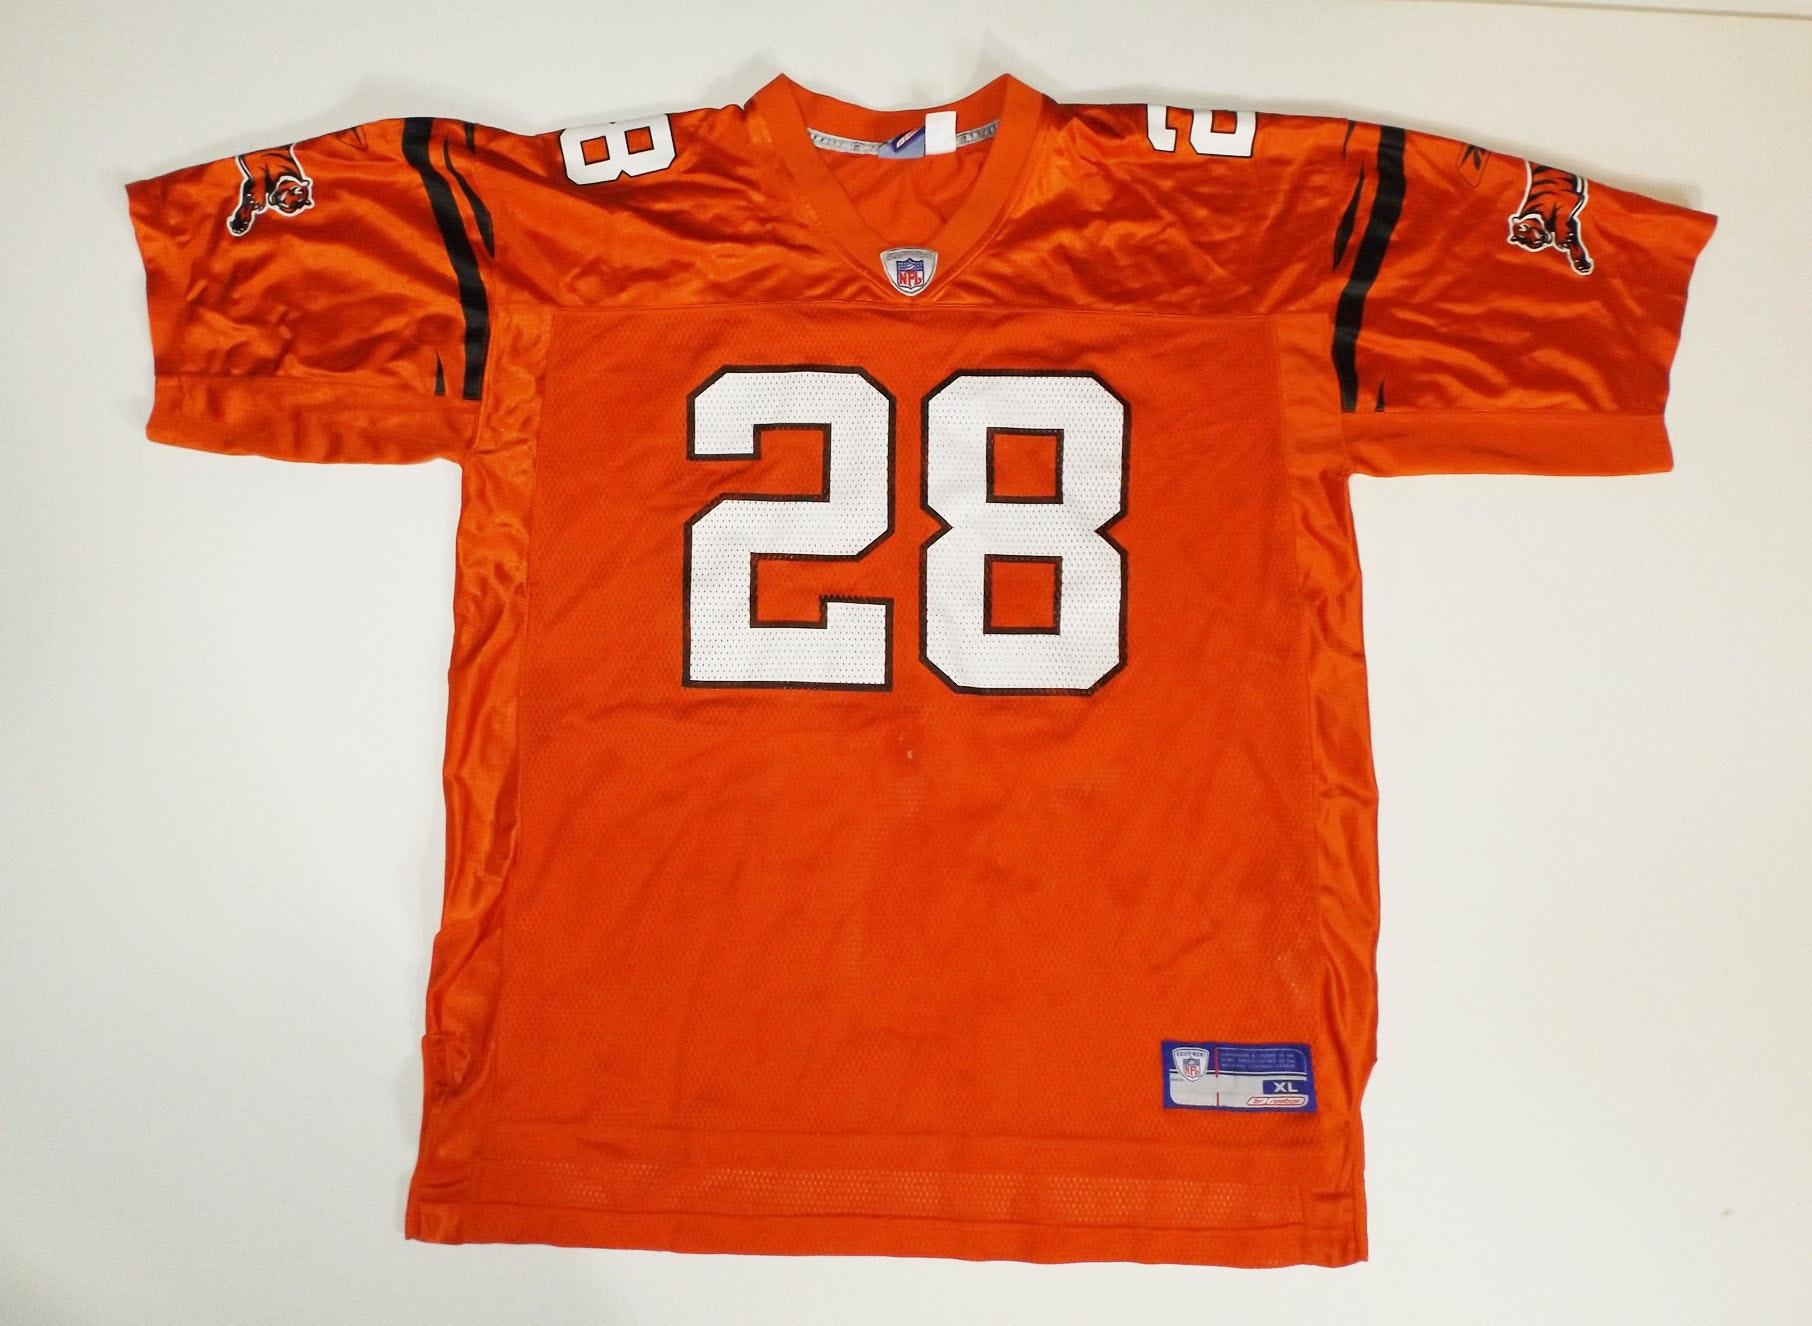 Authentic NFL Bengals Jersey